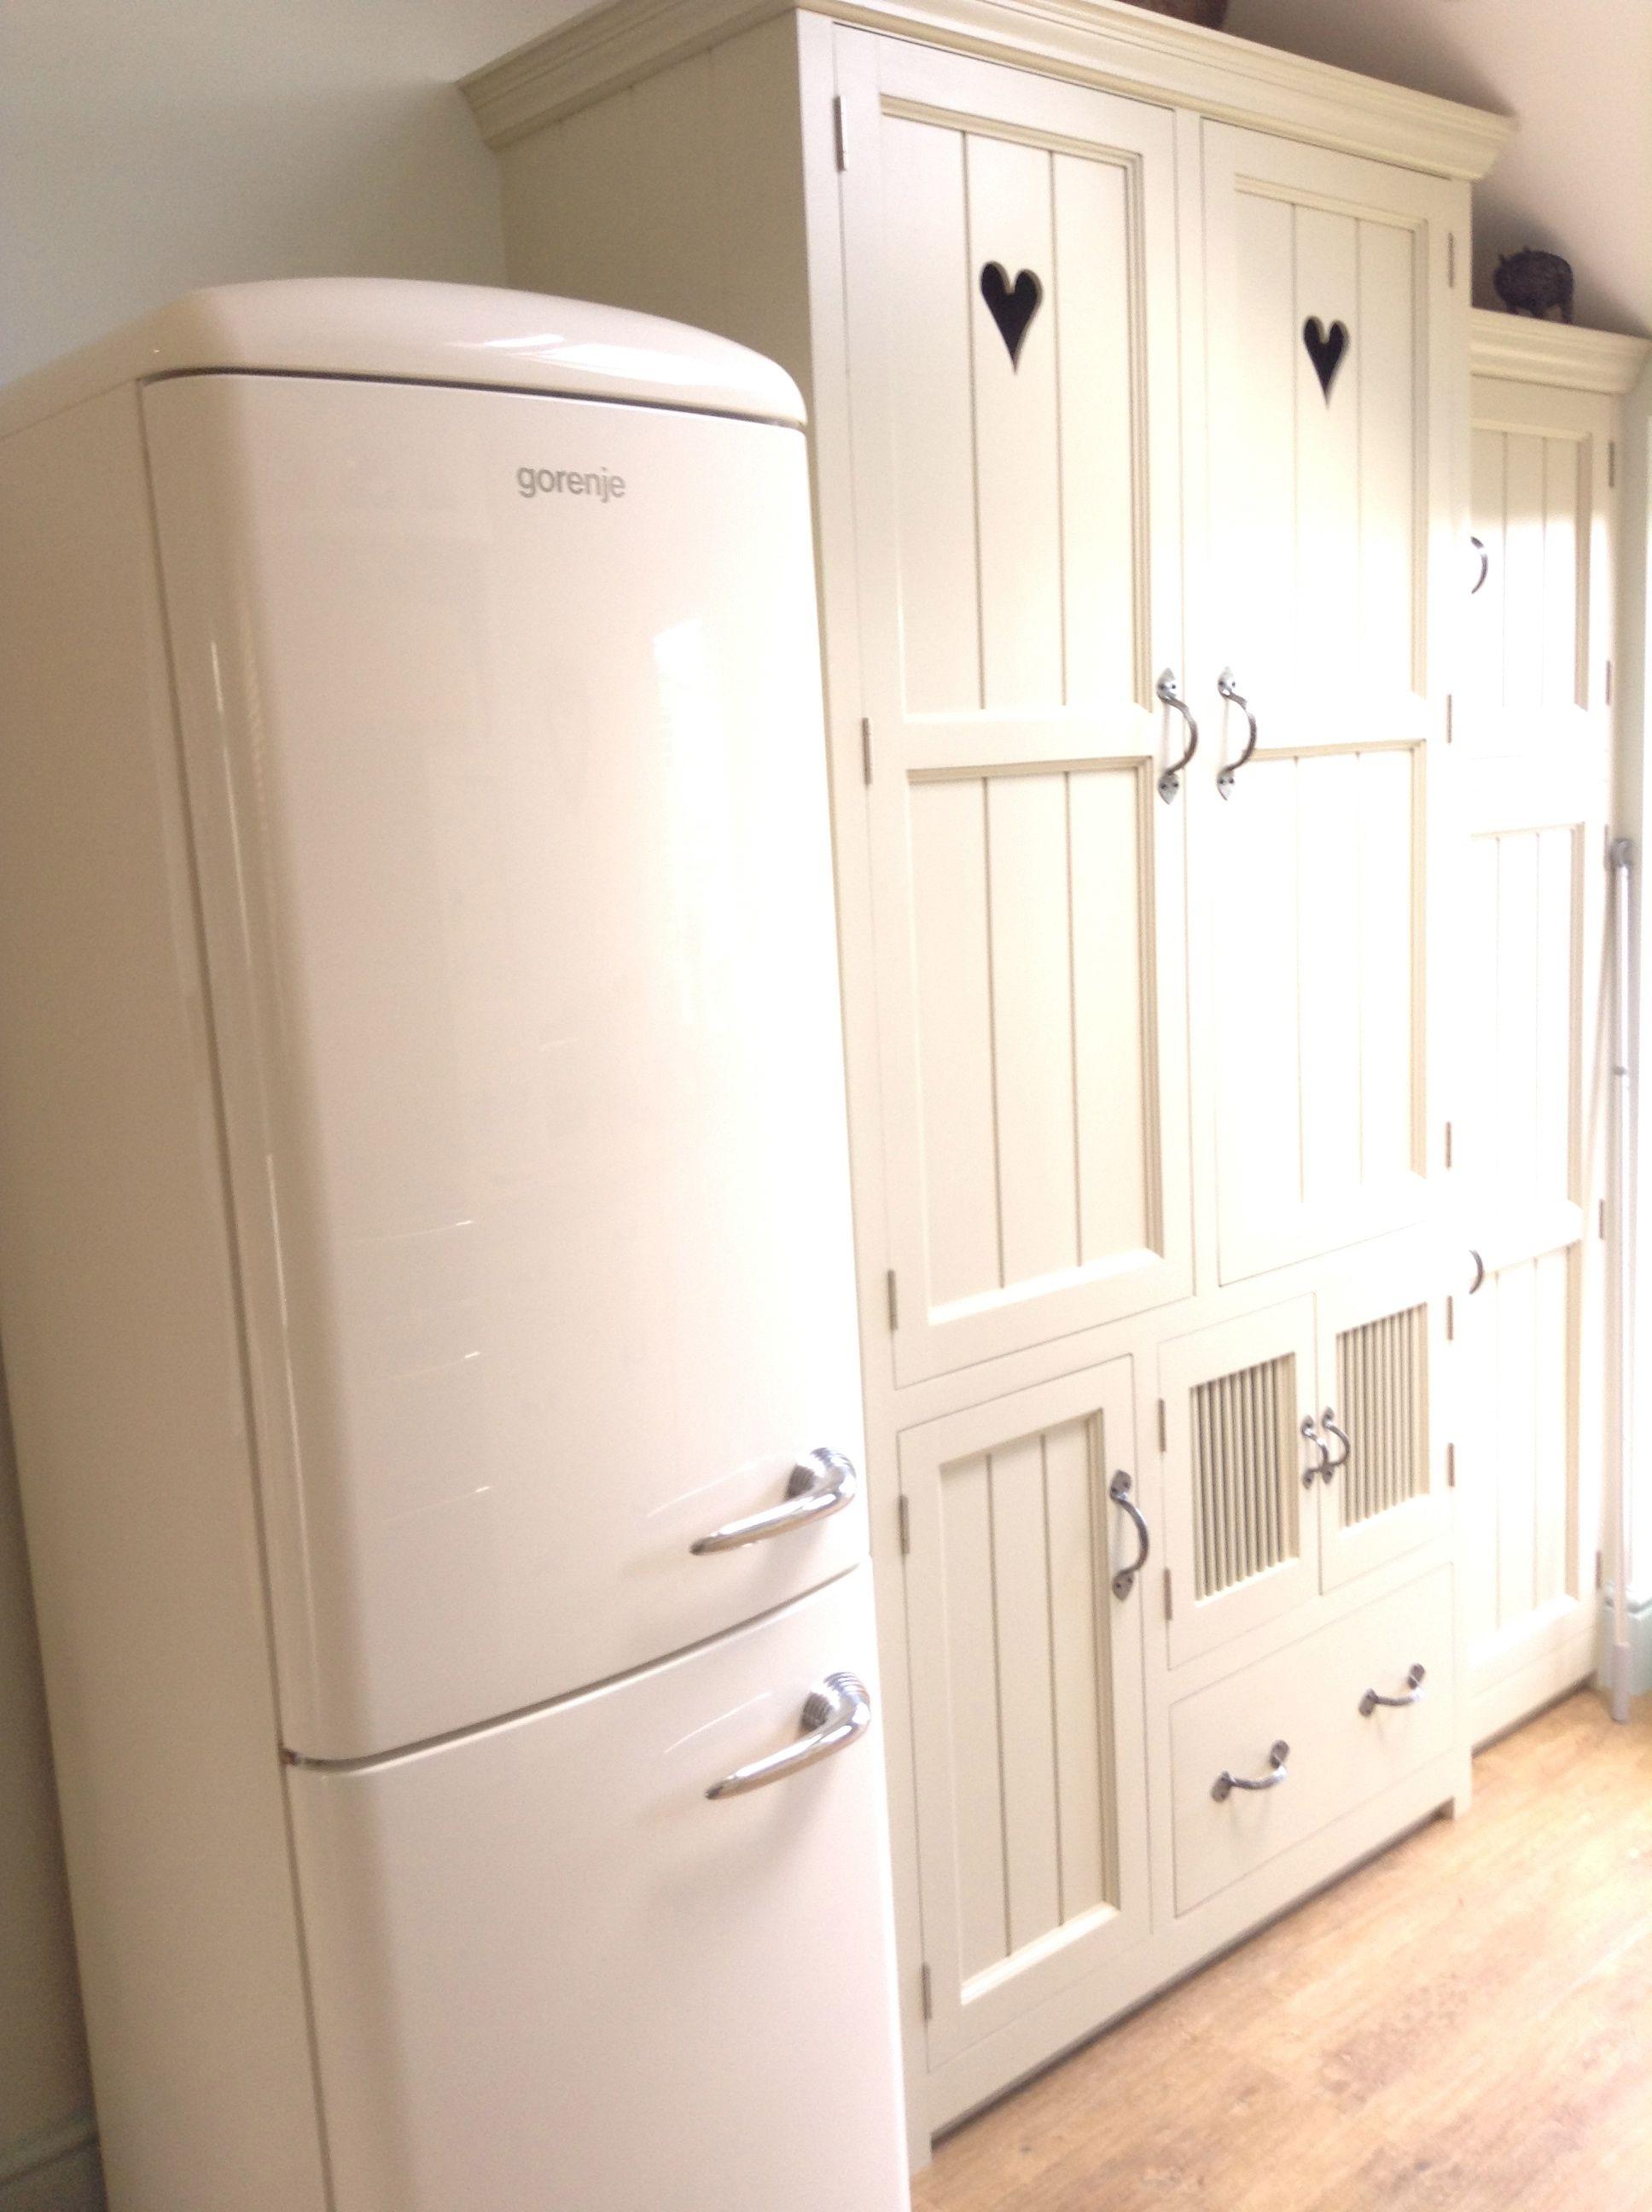 Gorenje Retro fridge freezer Luxury refrigerator, Retro